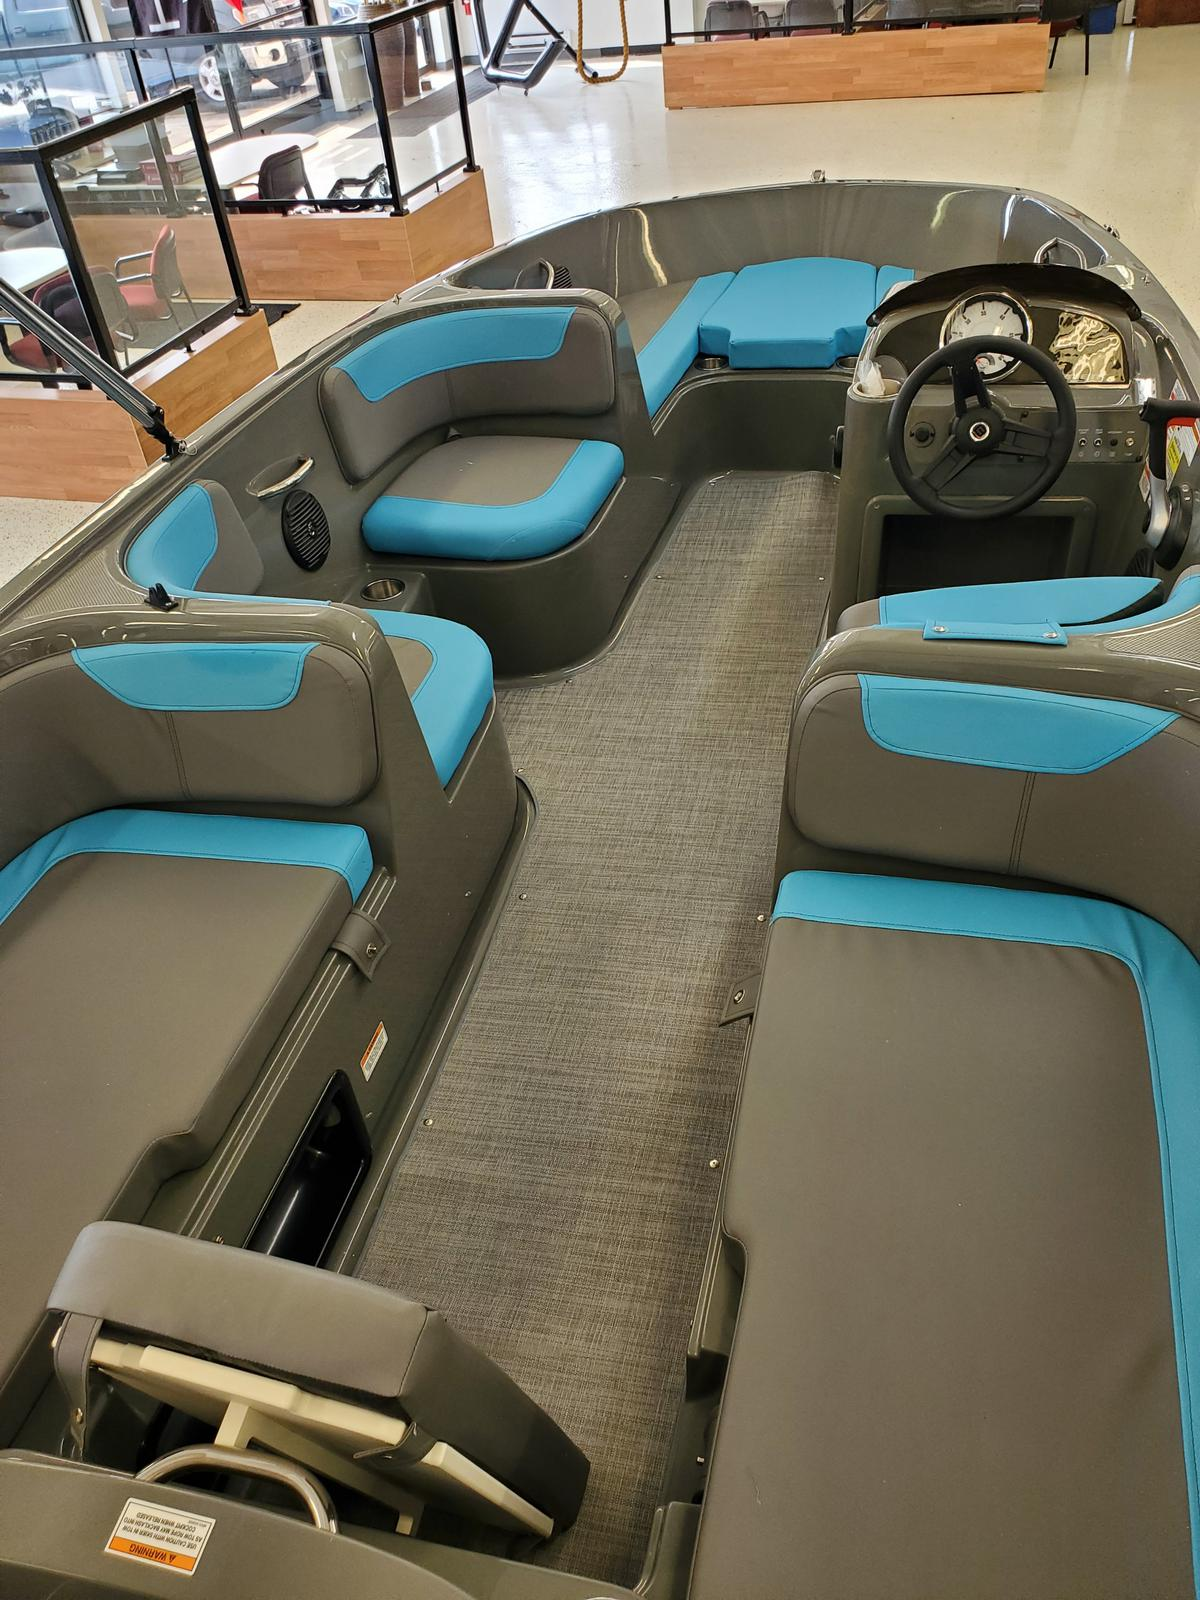 2021 Bayliner boat for sale, model of the boat is Element E18 & Image # 2 of 7